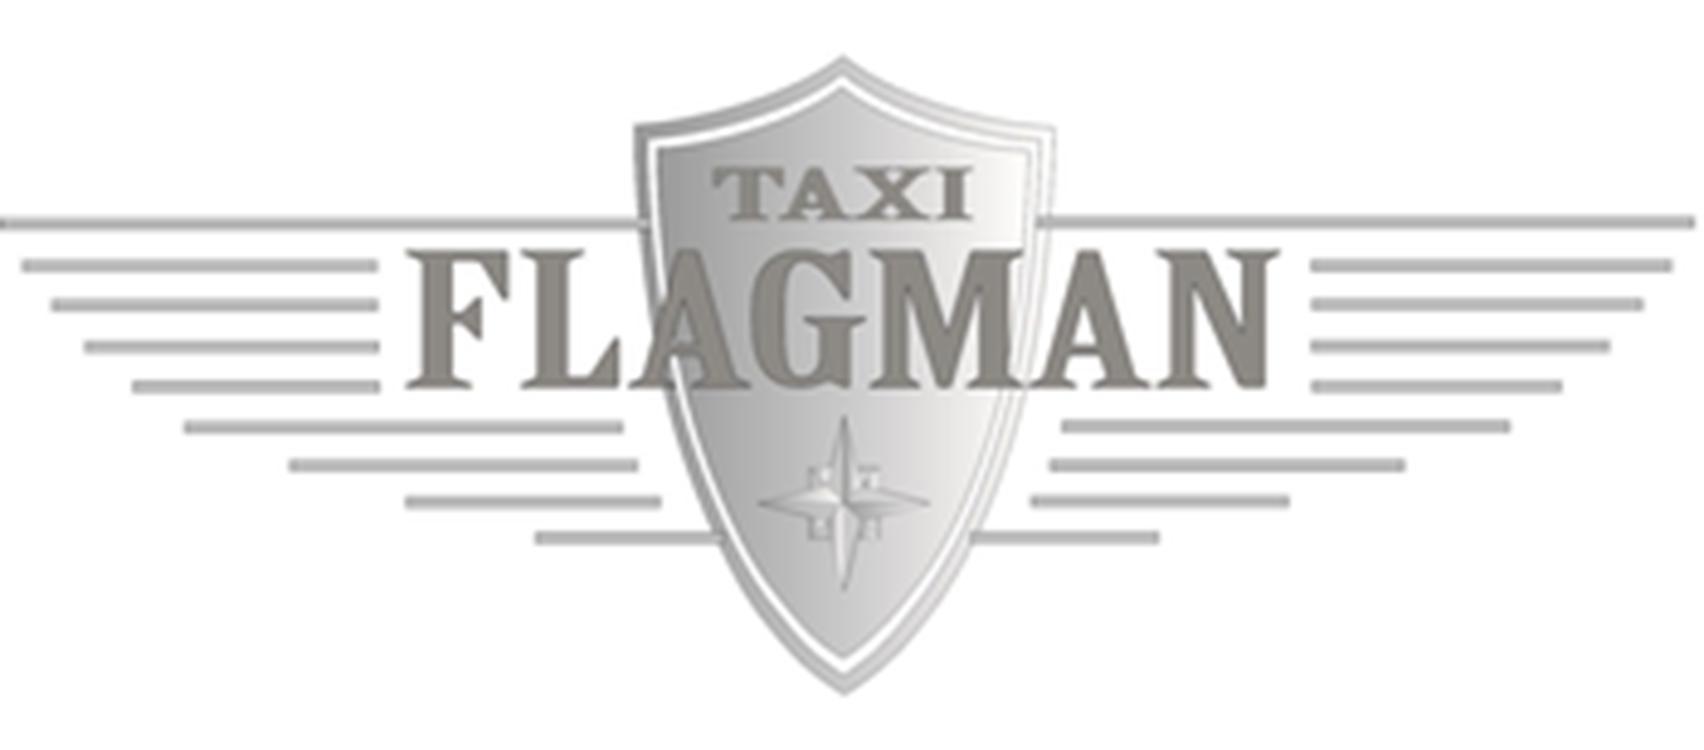 FLAGMAN-TAXI  (Київ)